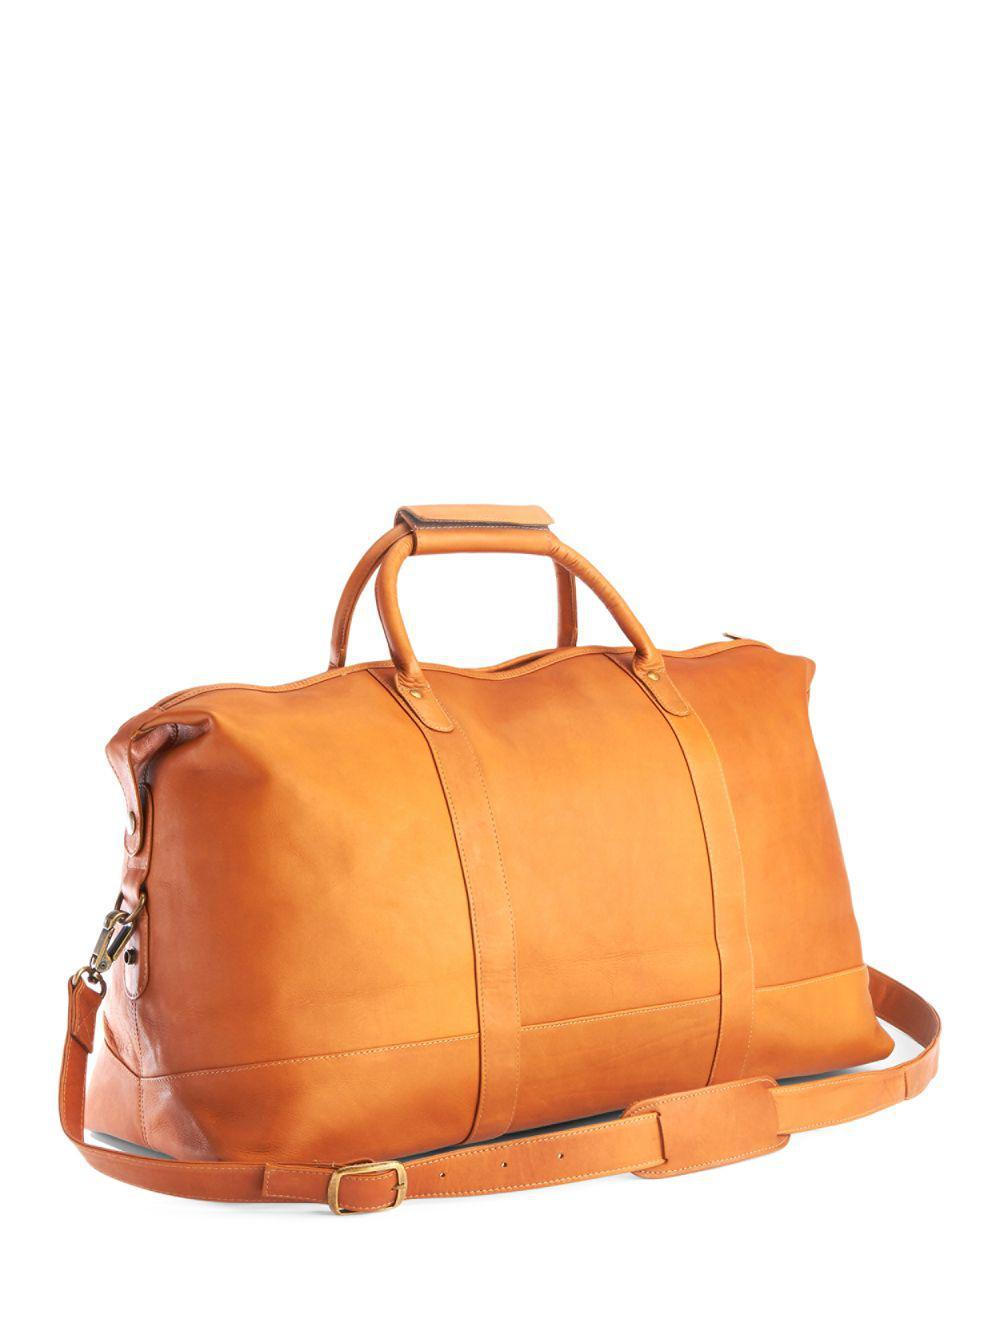 Lyst - Royce New York Columbian Leather Luxury Weekender Duffel Bag ... db784cd8740b2